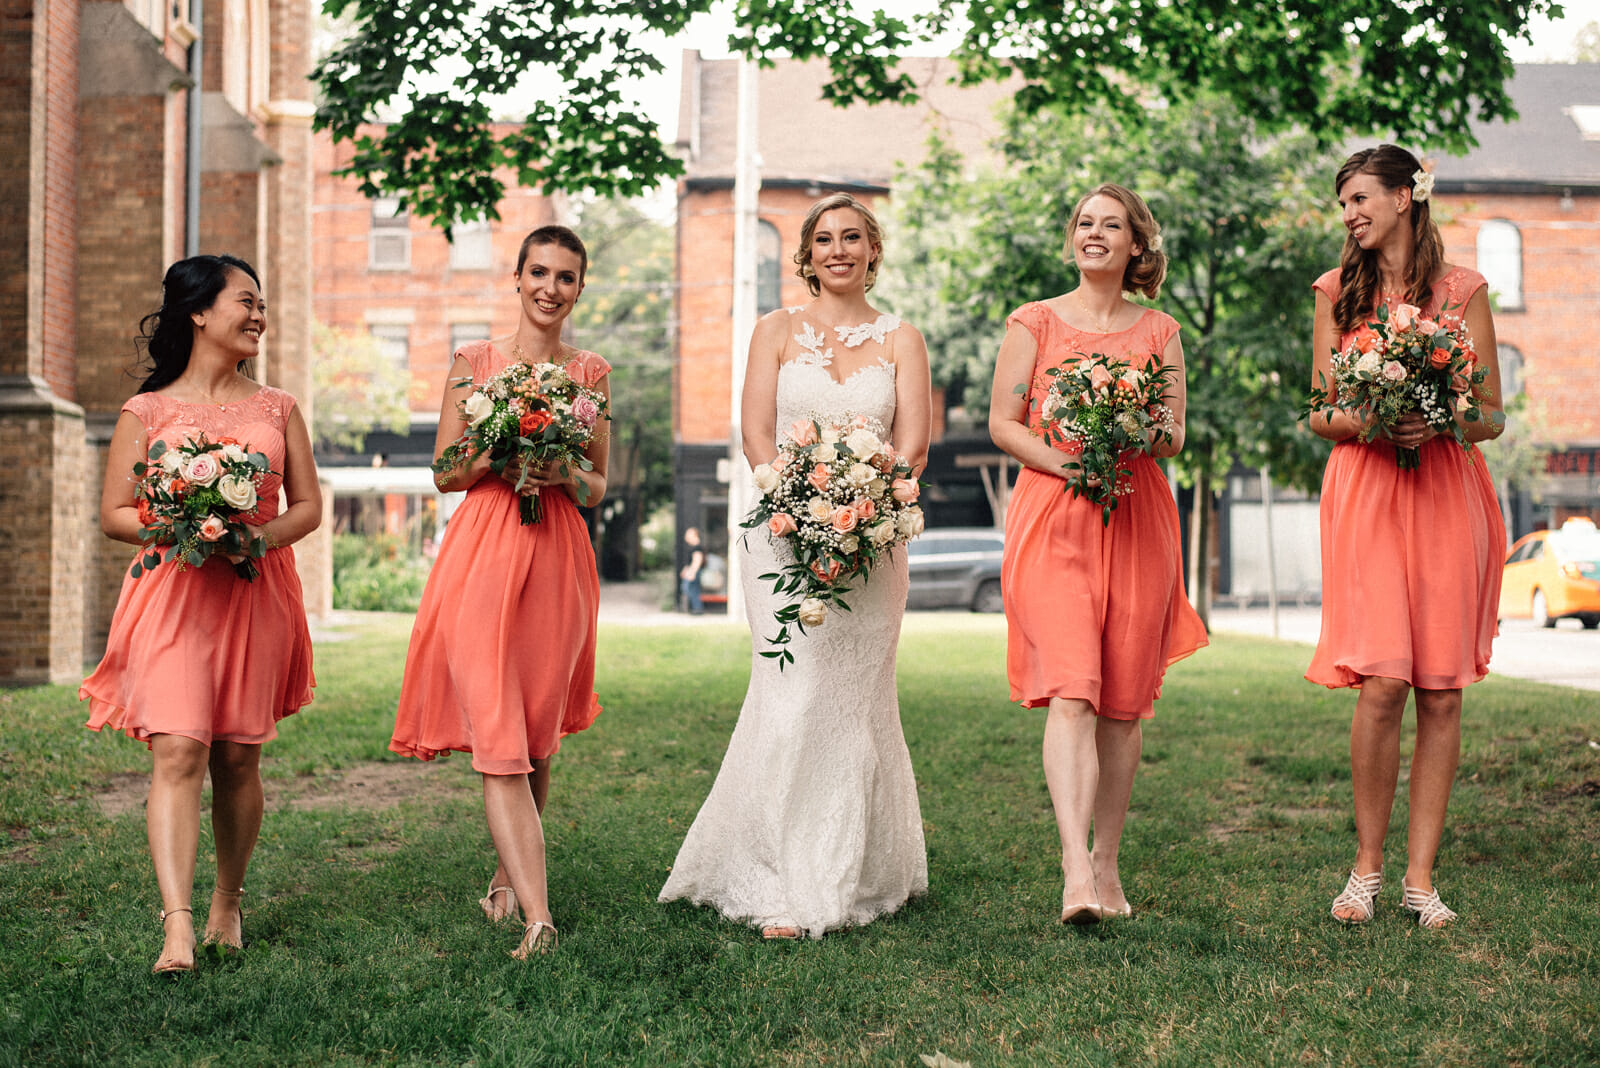 bride walks with bridesmaids by church in toronto